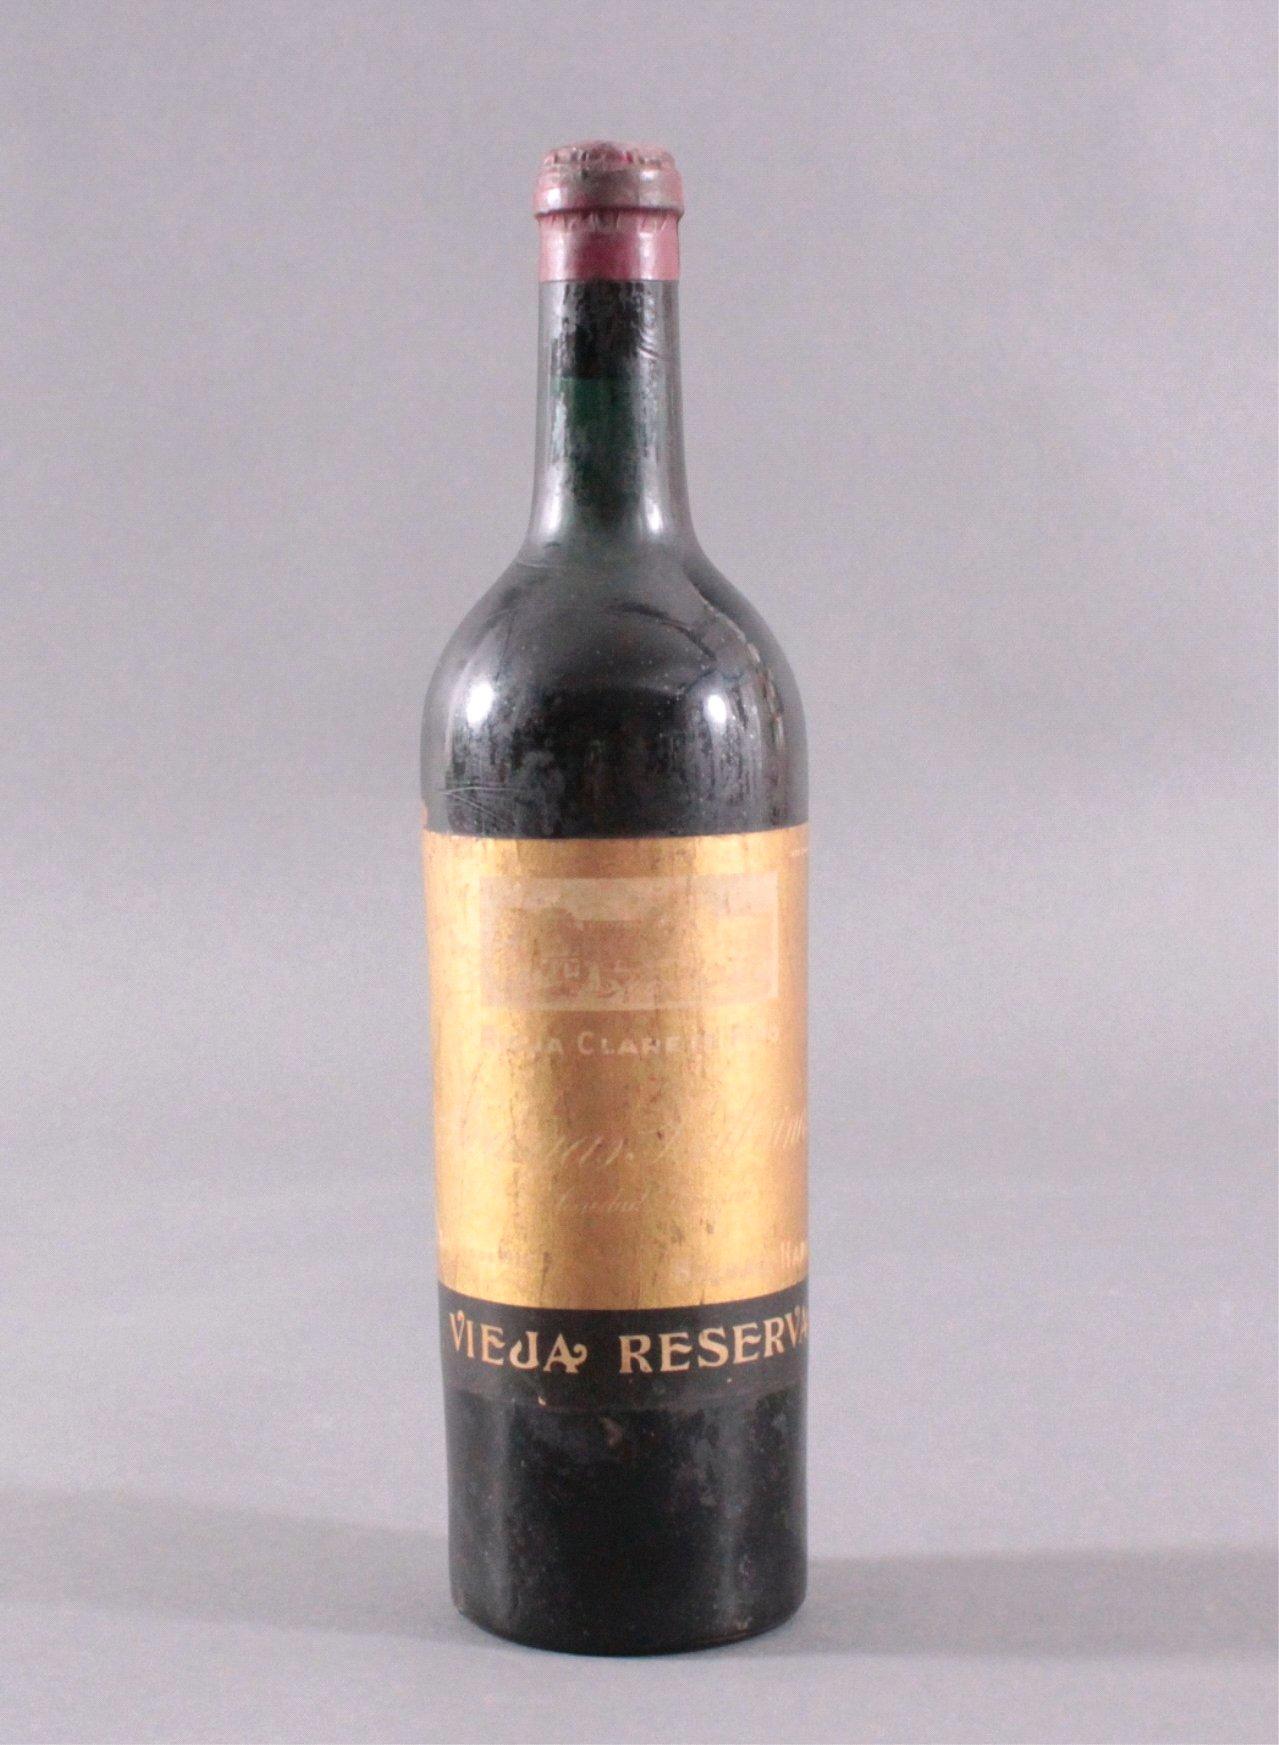 Rotwein, Vieja Reserva, Rioja Clarete Fino 1912